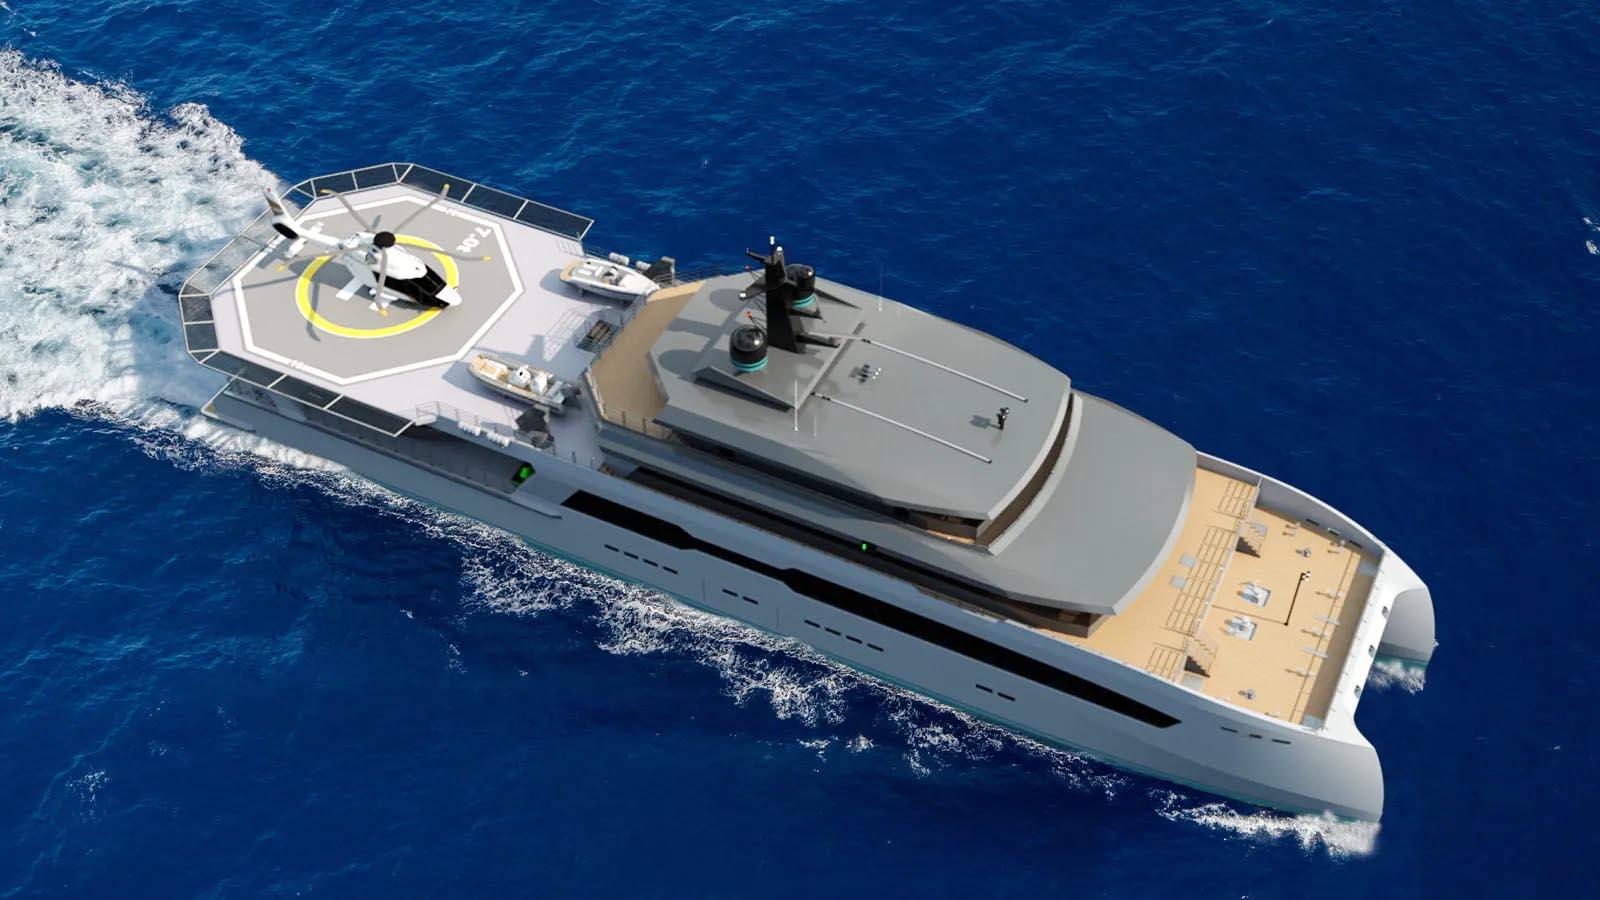 Heven Yacht